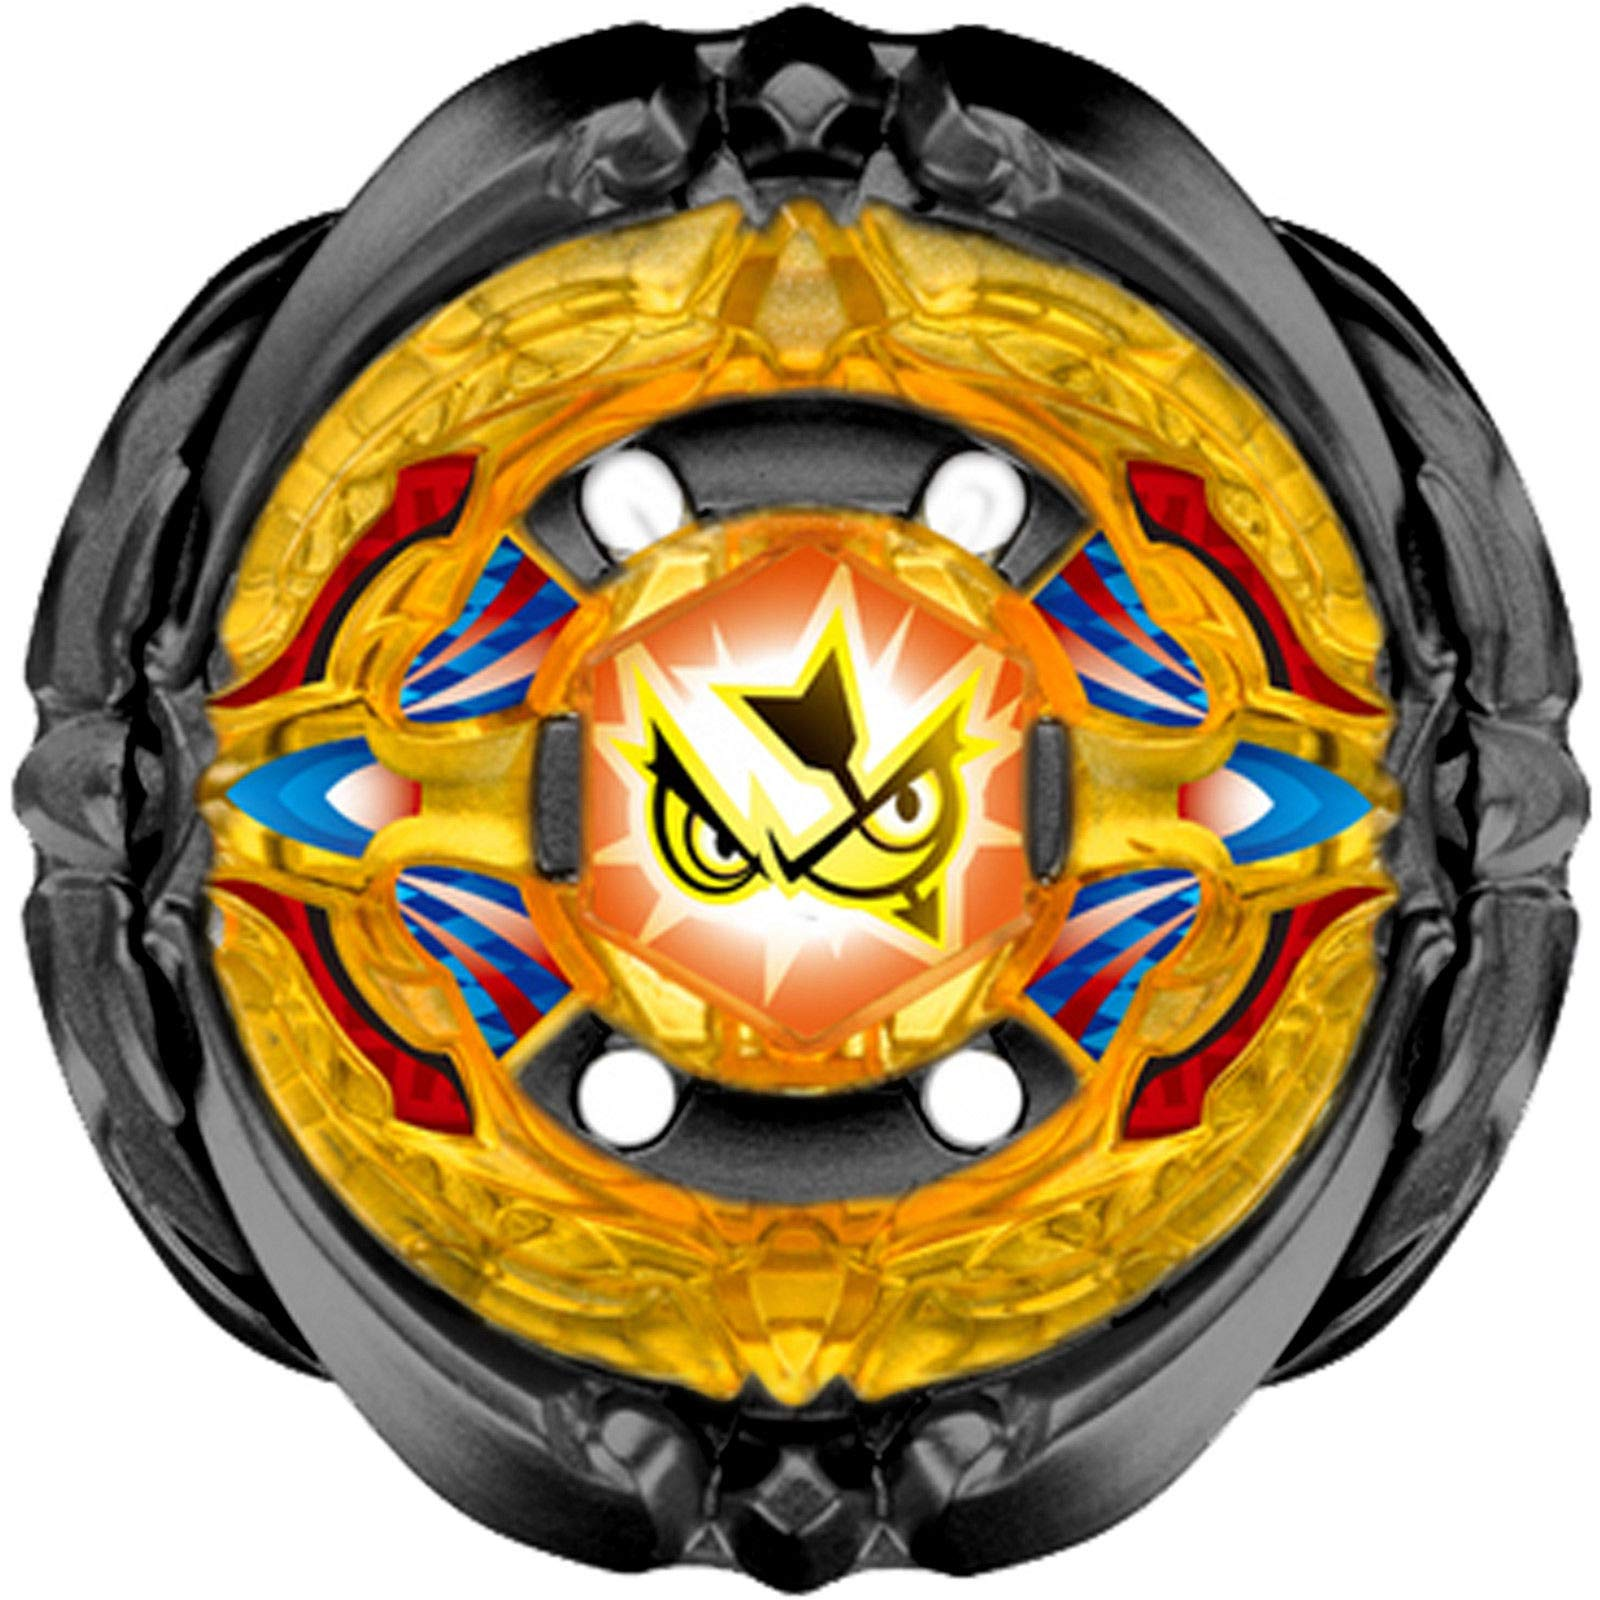 AmazingShopers Black Special Edition Flash Sagittario WBBA Beyblade